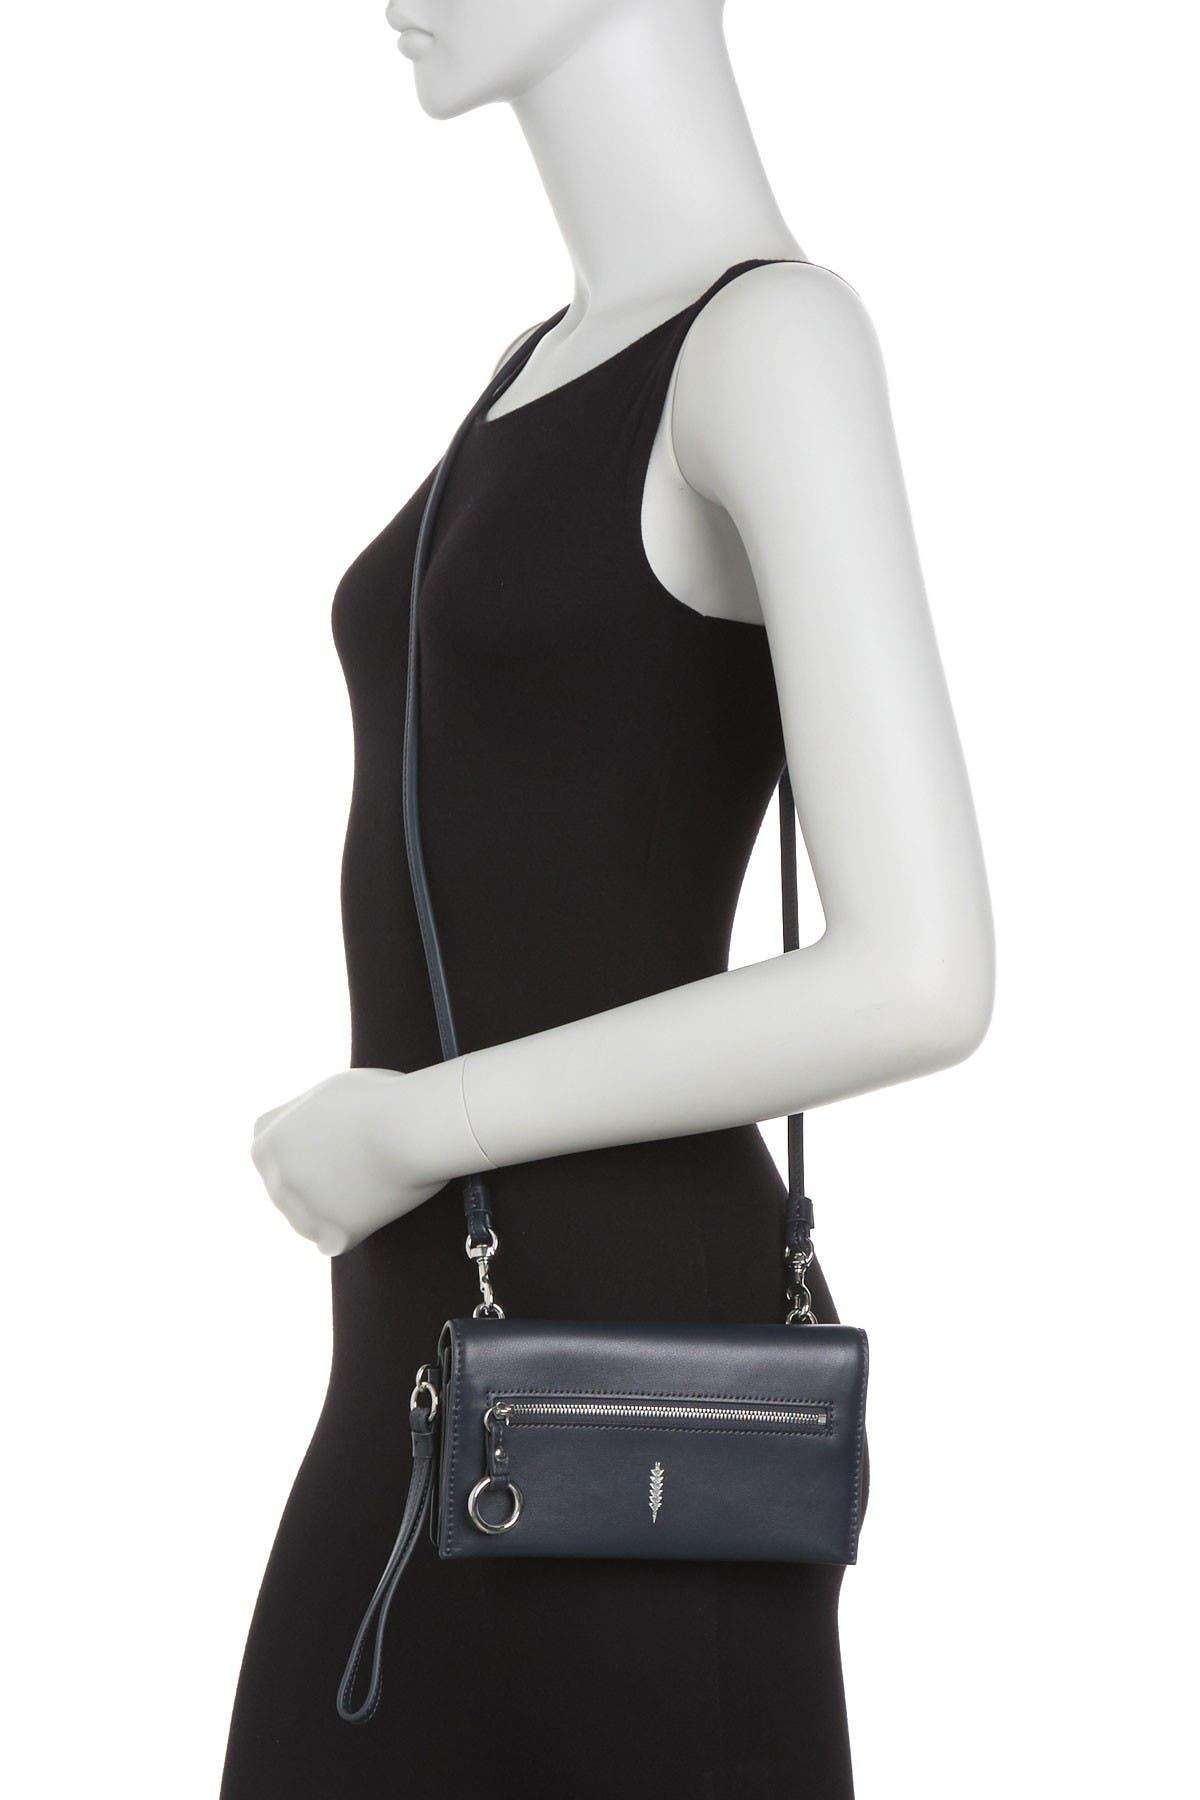 Image of THACKER Eve Crossbody Wallet